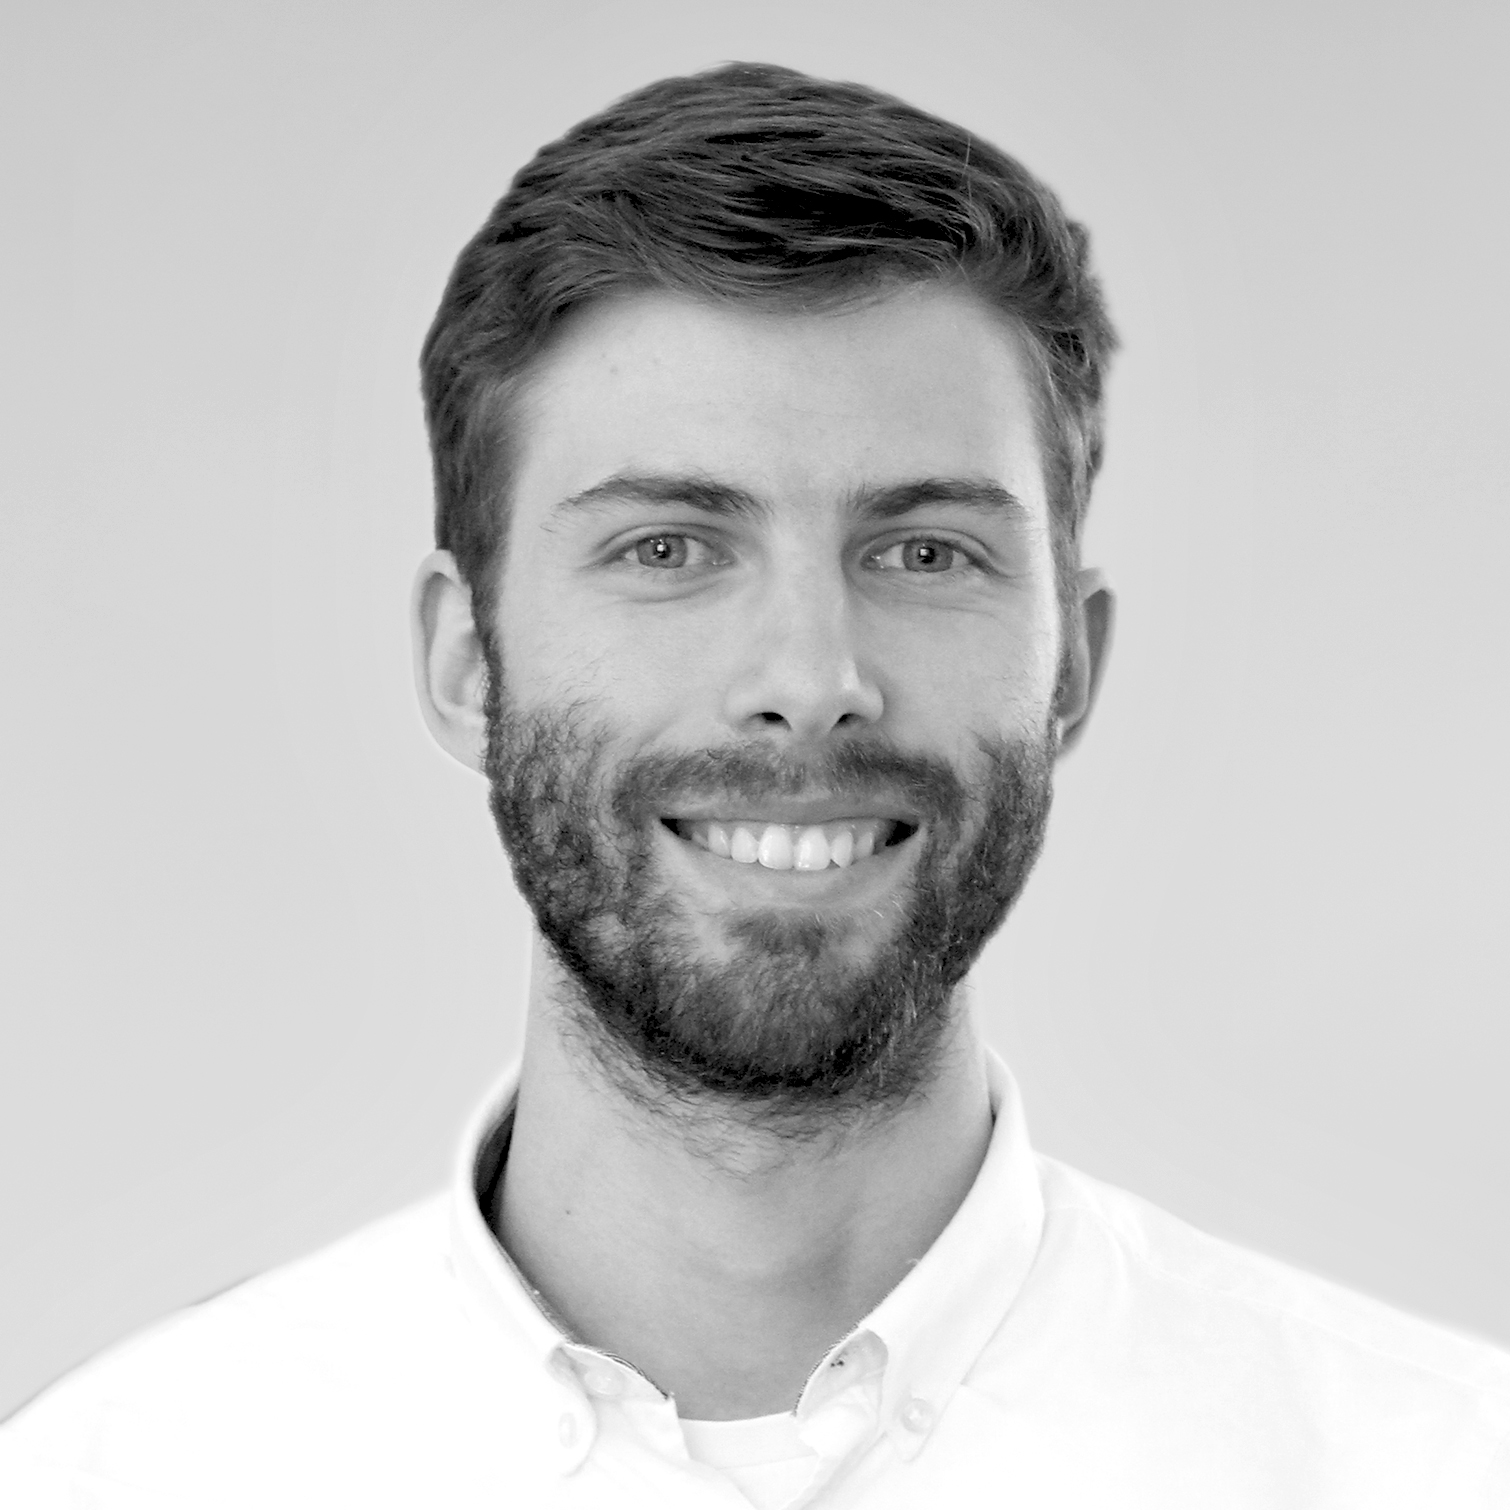 https://ksrarchitects.com/wp-content/uploads/2021/06/Miguel-Medina-1.jpg